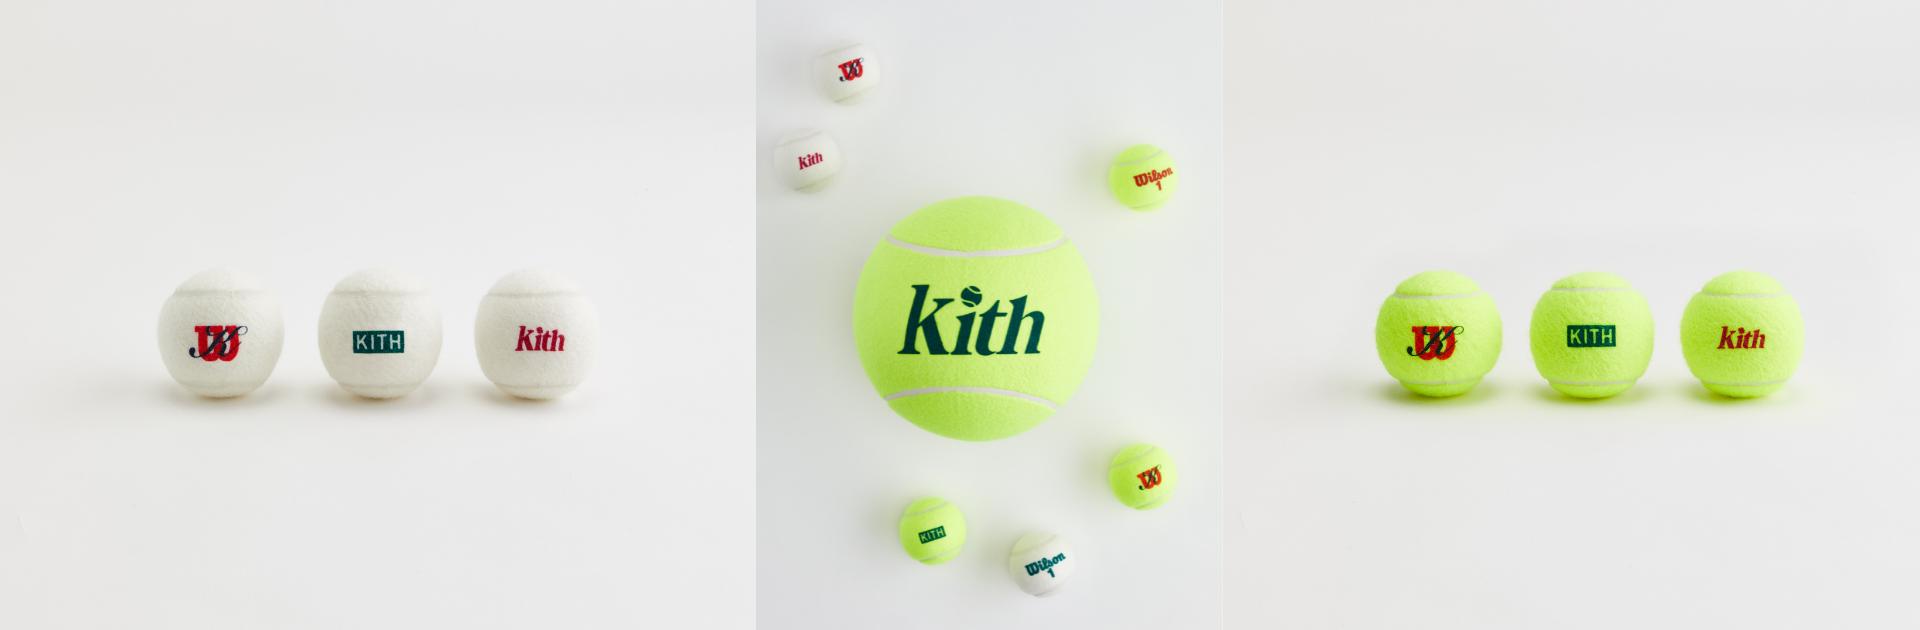 kith x wilson tennis balls